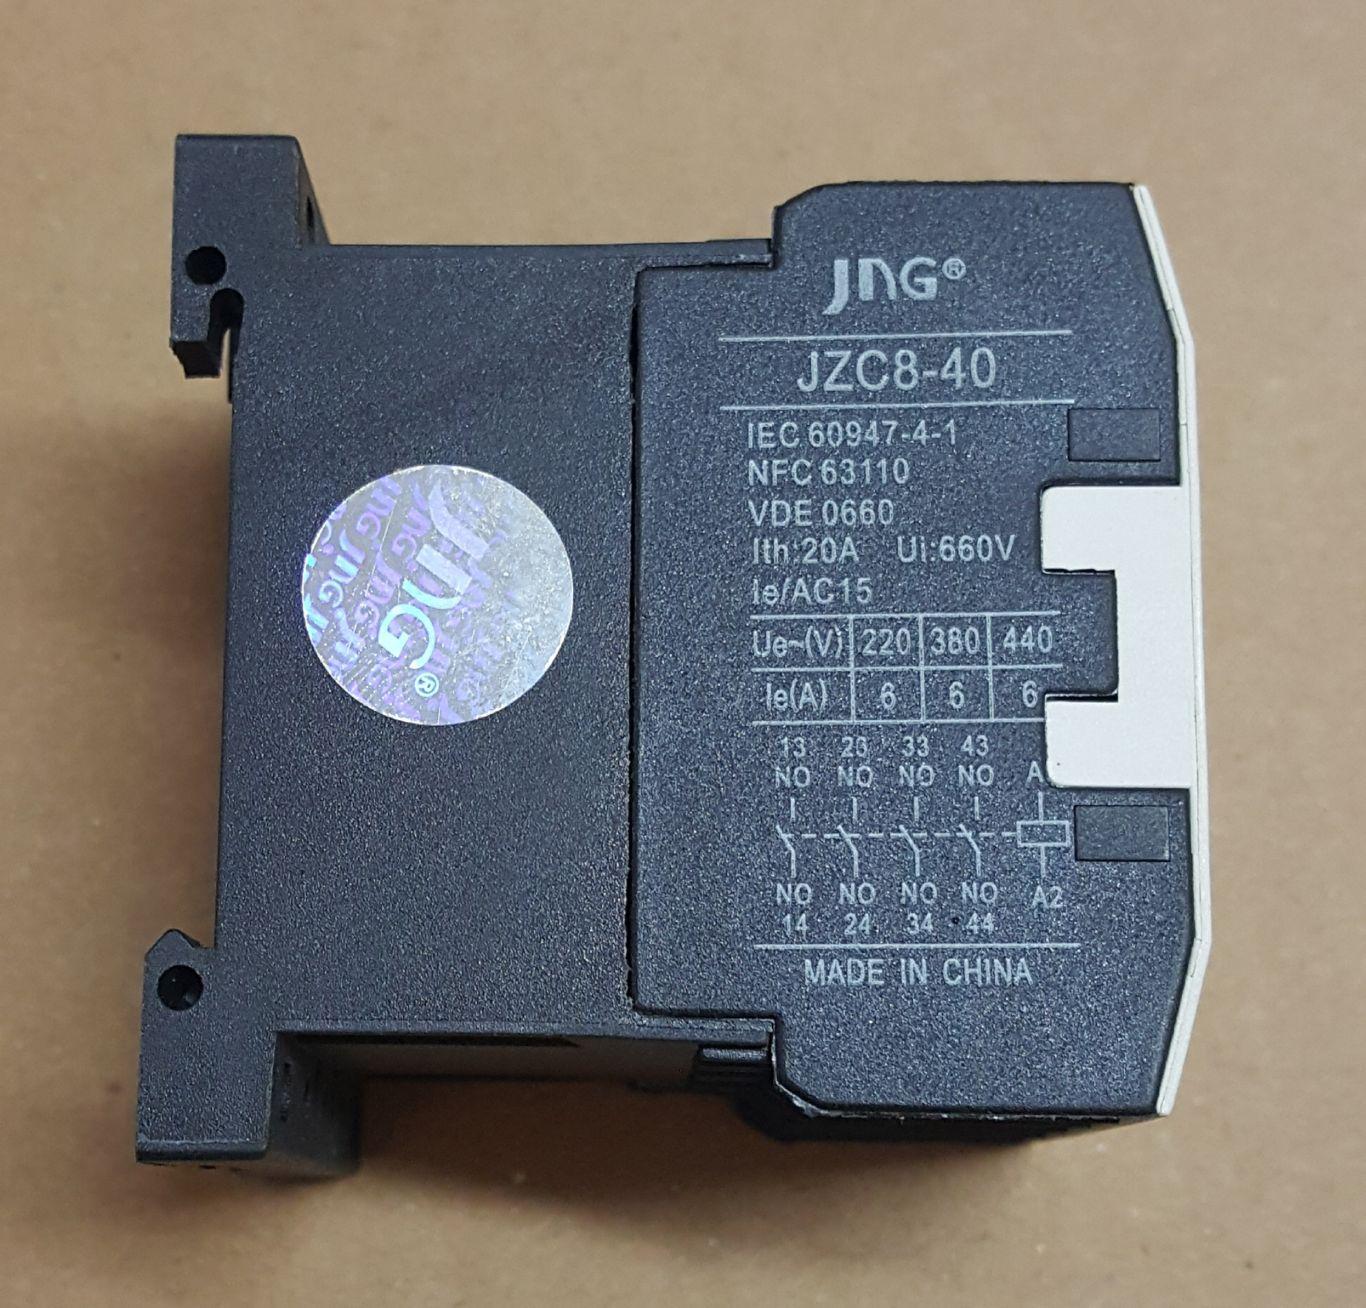 MINI CONTATOR AUXILIAR JZC8-40 (9 AMPERES) 220V FAIXA AJUSTE 20A